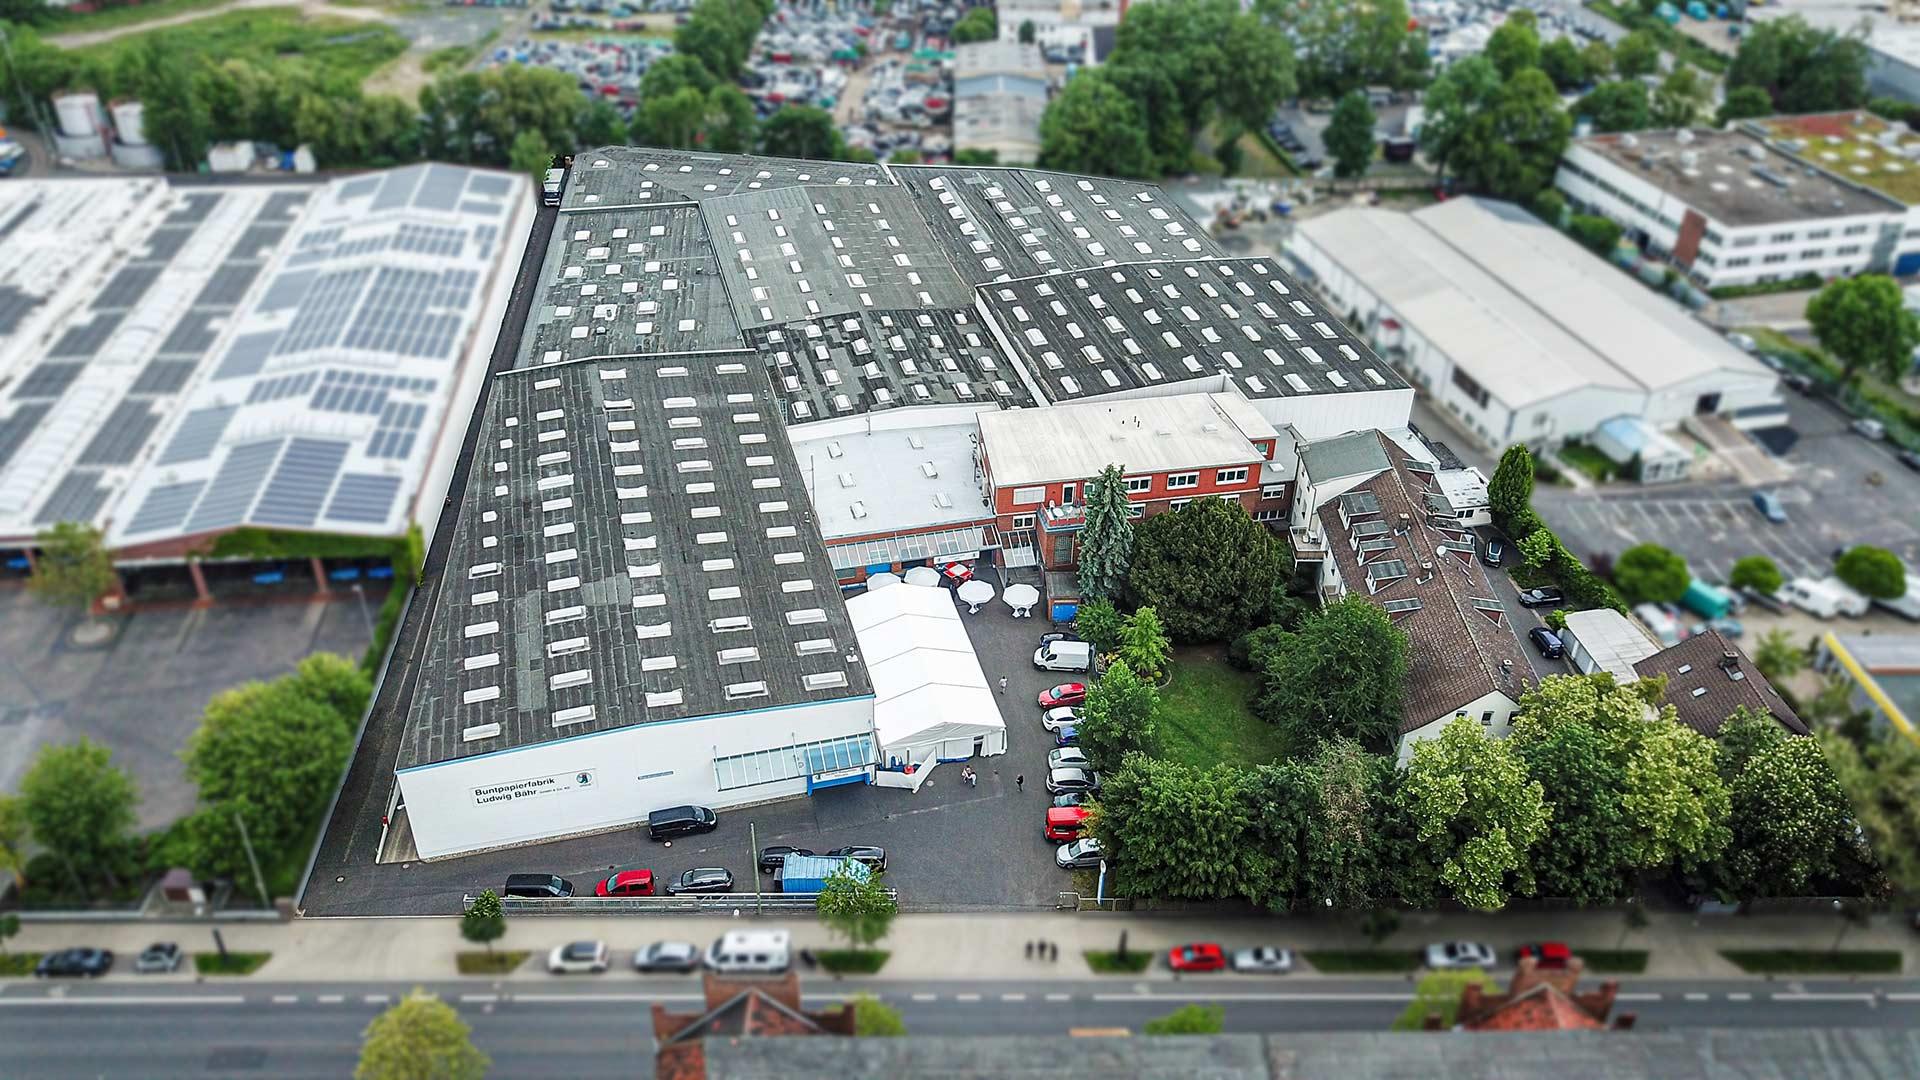 Buntpapierfabrik Ludwig Bähr GmbH & Co. KG - Company site Kassel